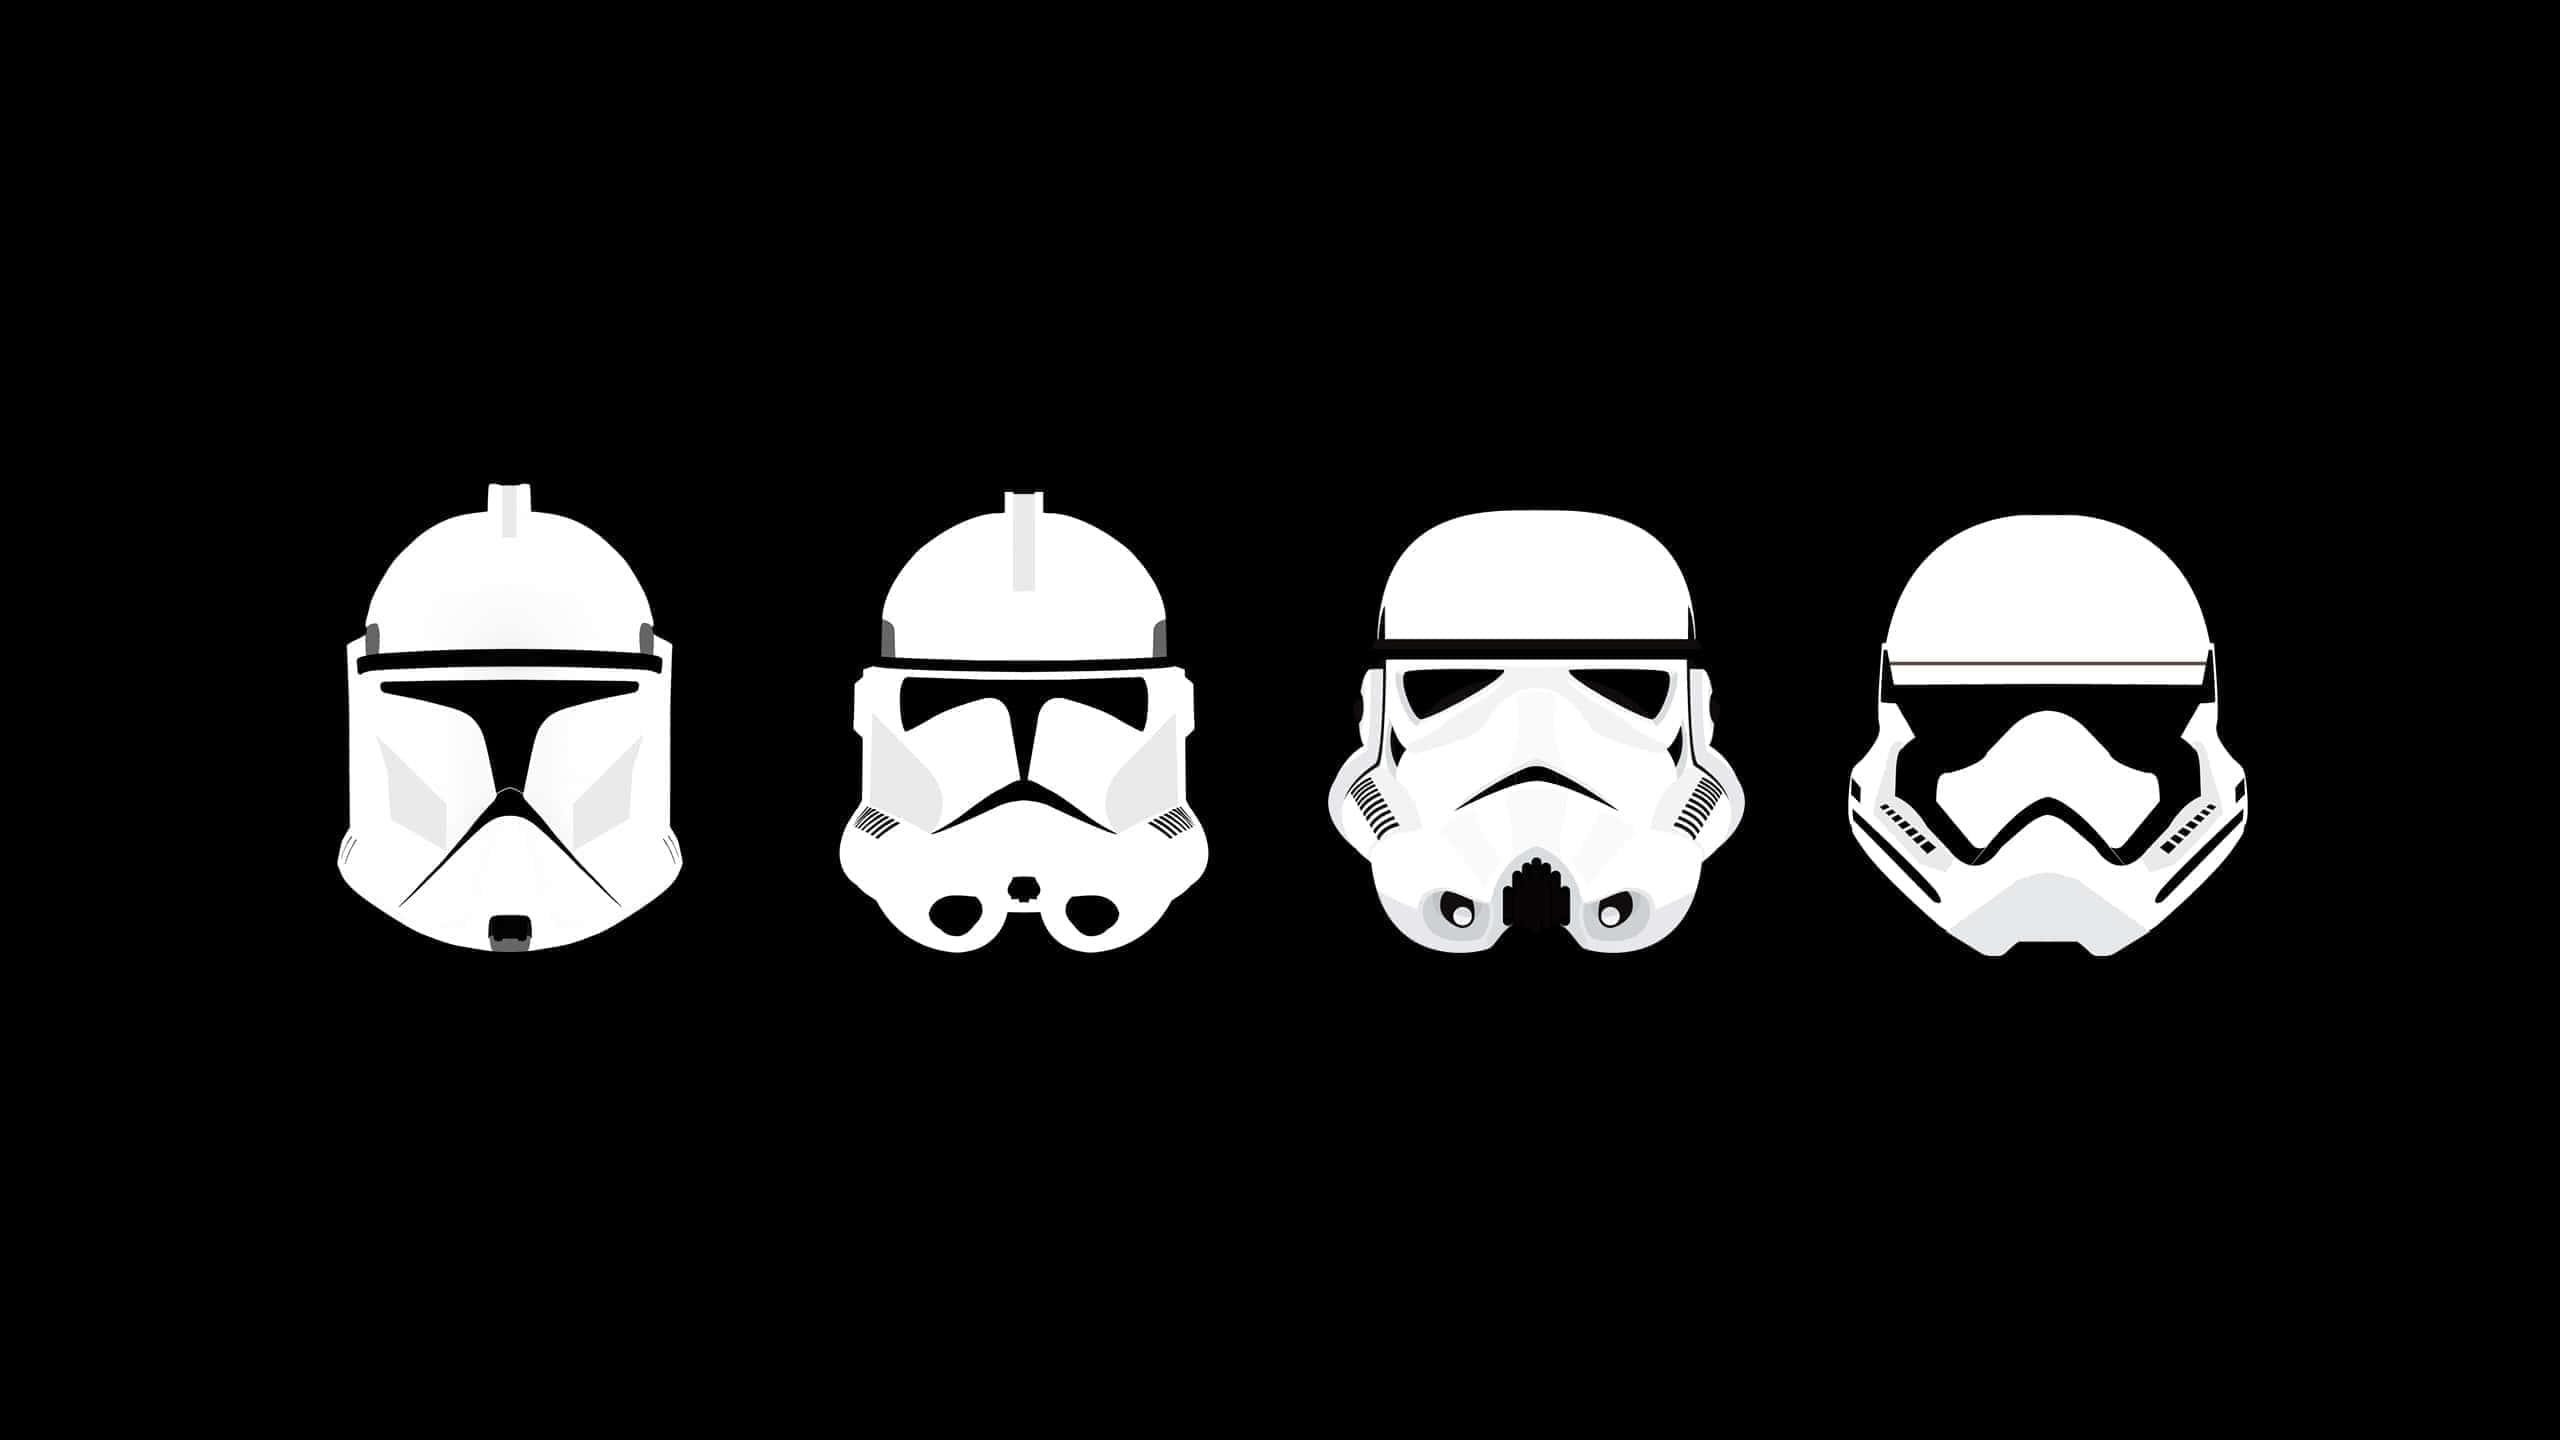 Download Wallpaper Black And White Star Wars - star-wars-trooper-evolution-wqhd-1440p-wallpaper  Gallery_708430.jpg